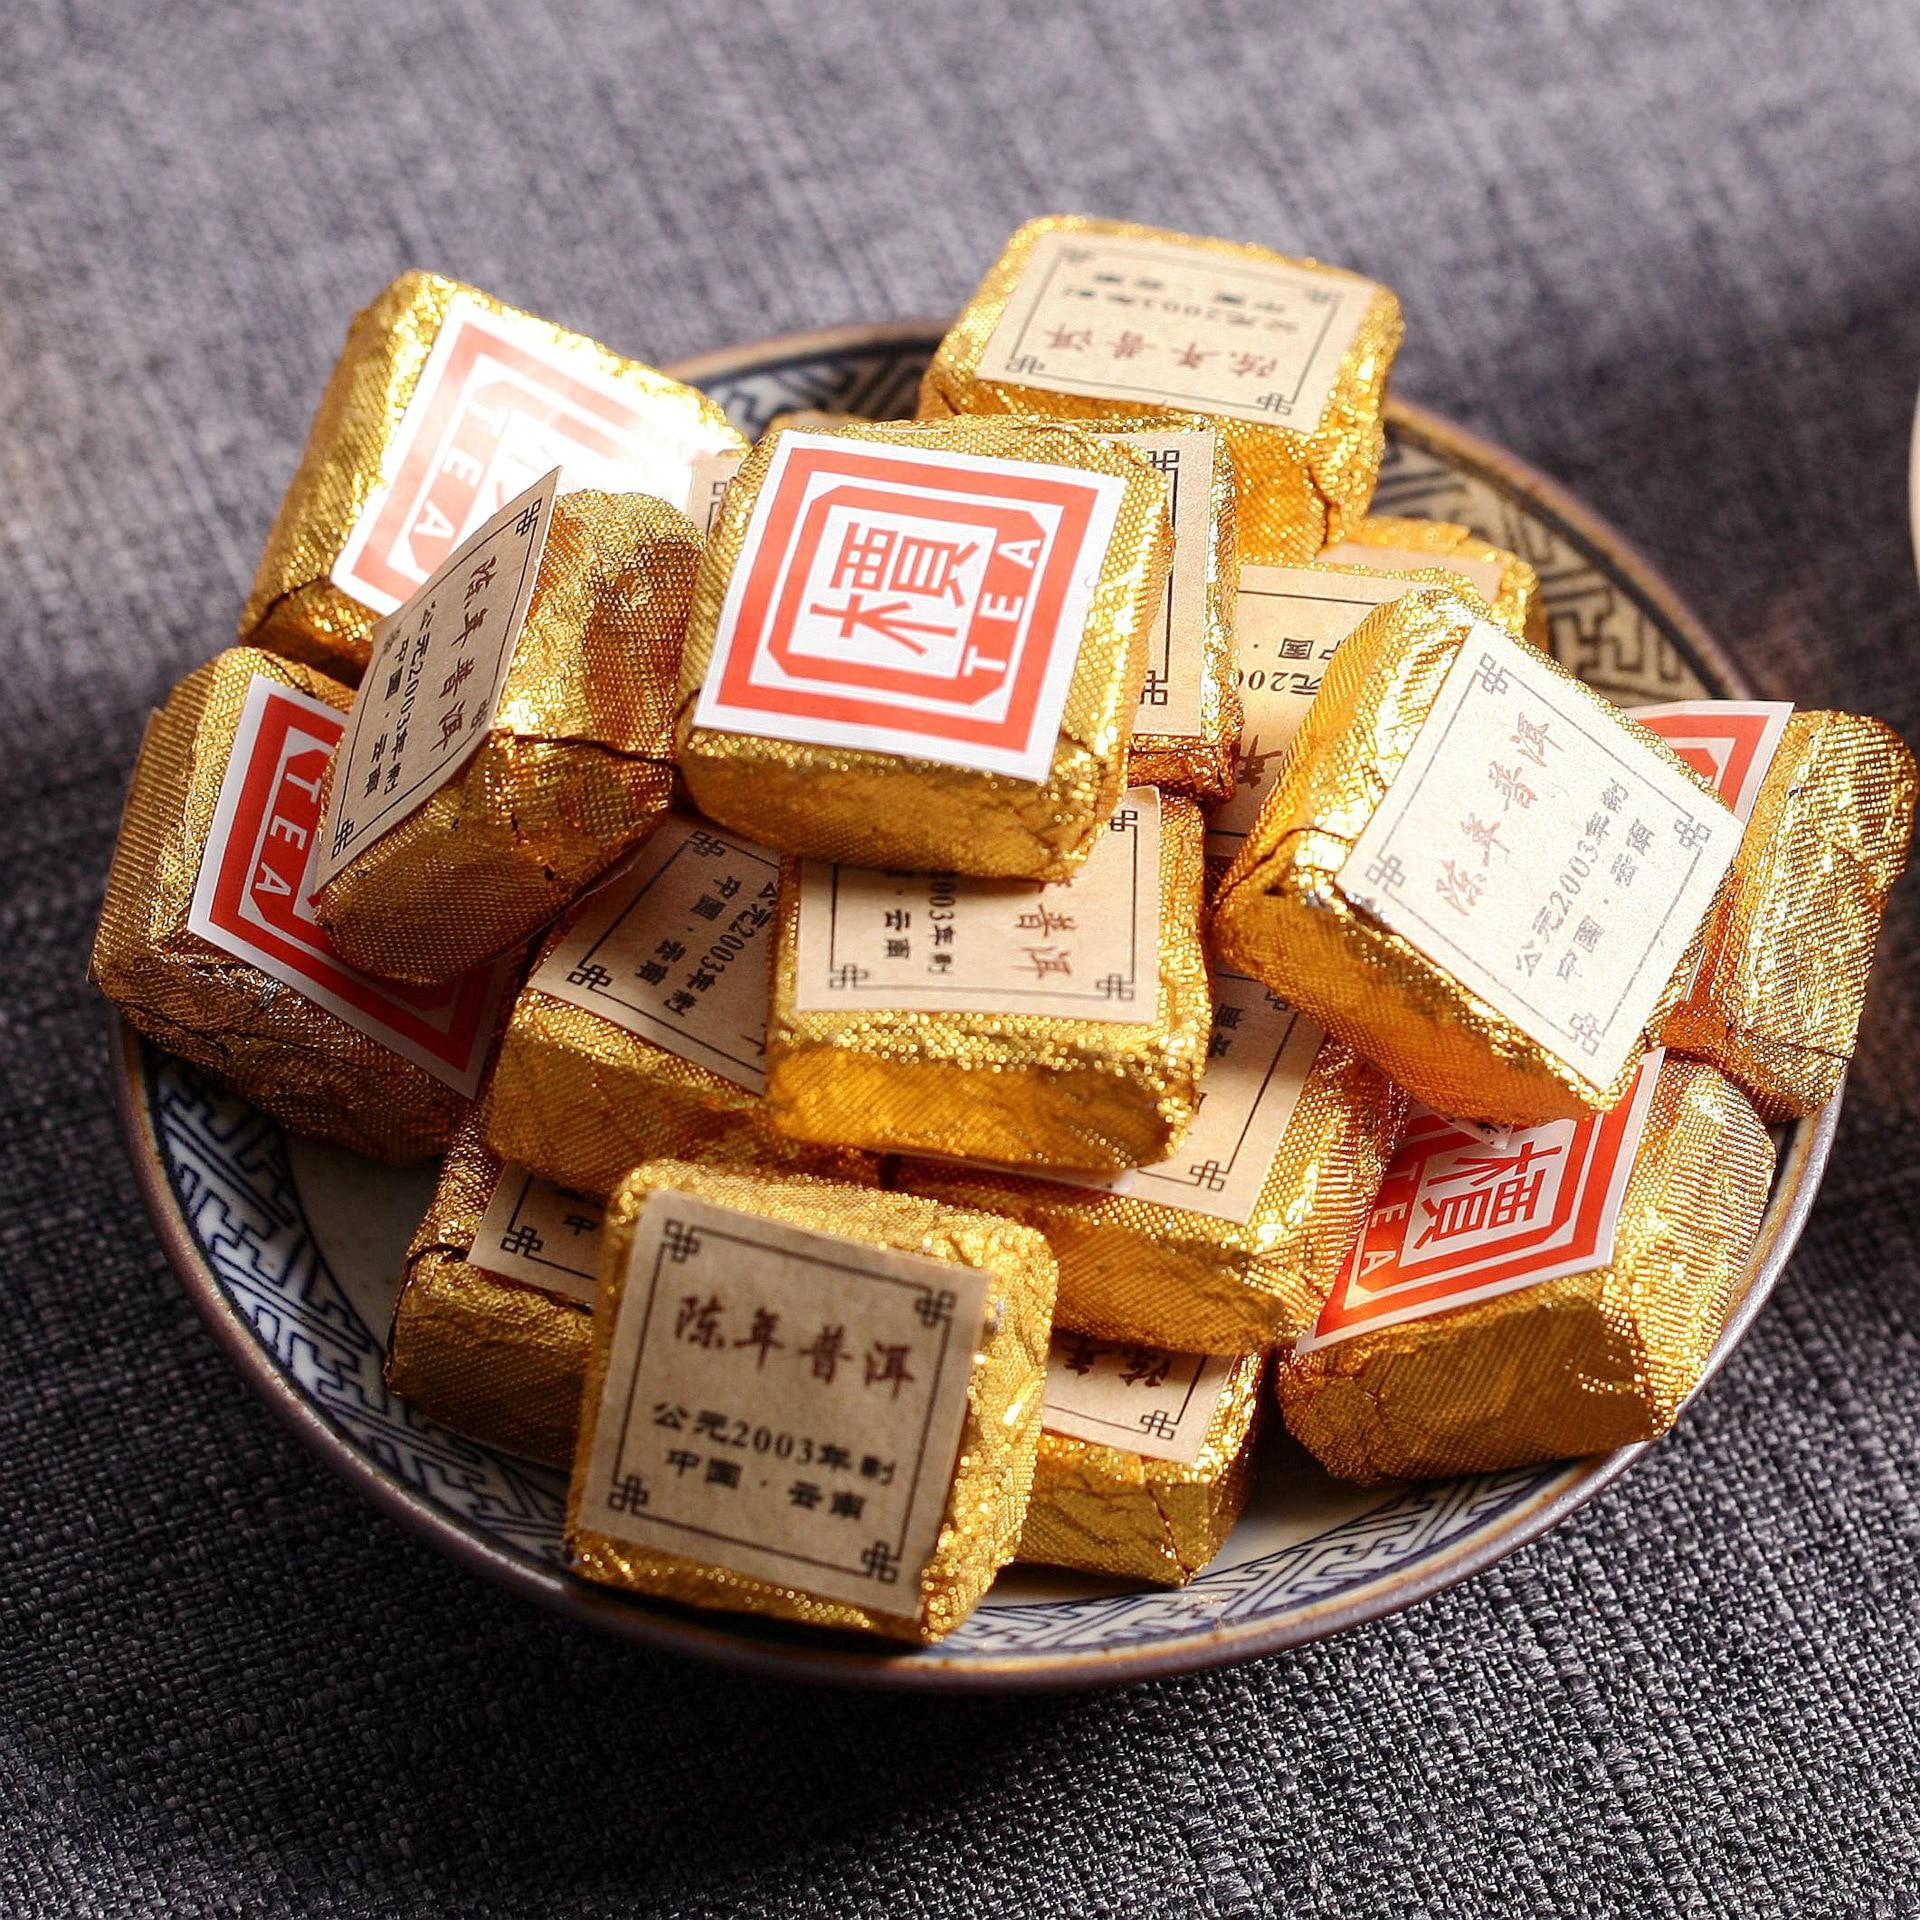 More Than 15 Years Old China MengHai Golden Bud Ripe Pu Er Tea 2003 Year Chinese Puer Tea Brick Cooked Pu Erh Tea Puerh Tea